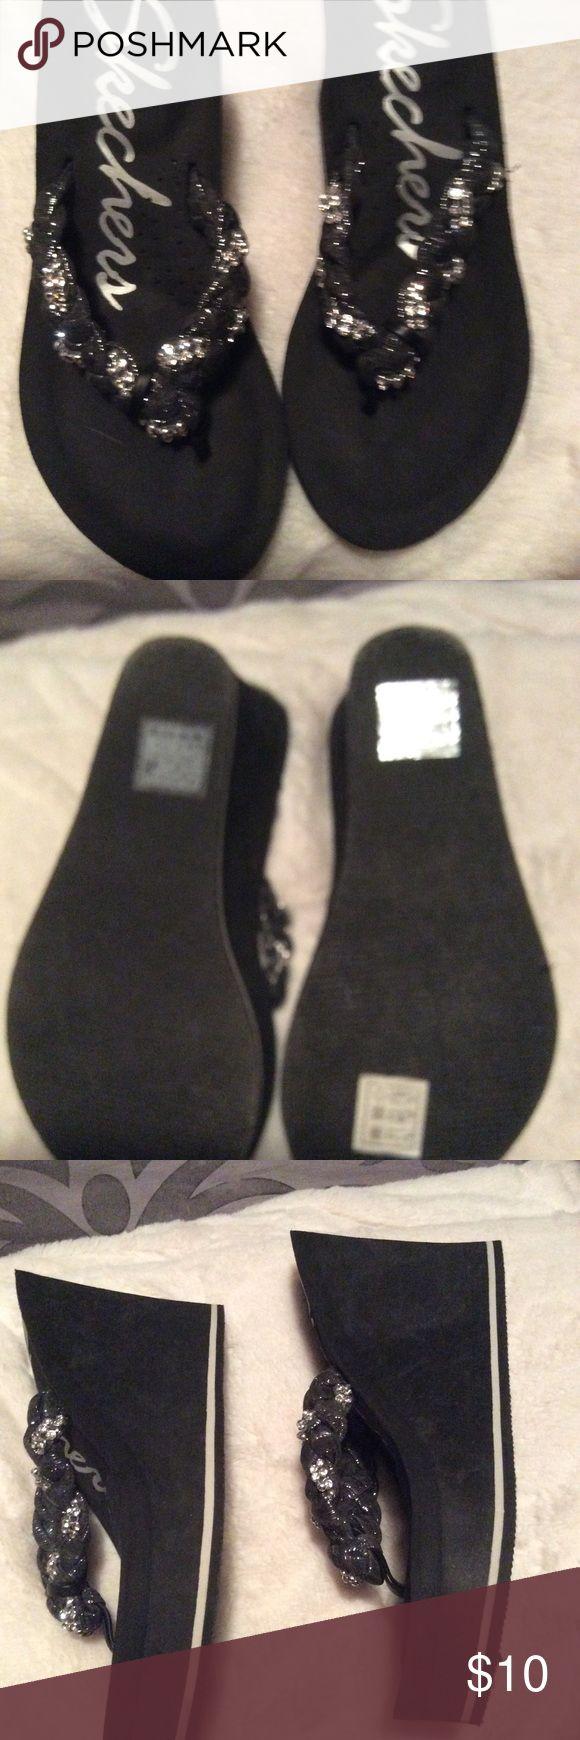 Women's size 7 Skechers wedge flip flop Women's size 7 black wedge flip flop sandals. Made by Skechers. Worn a few times. Good condition. Skechers Shoes Wedges